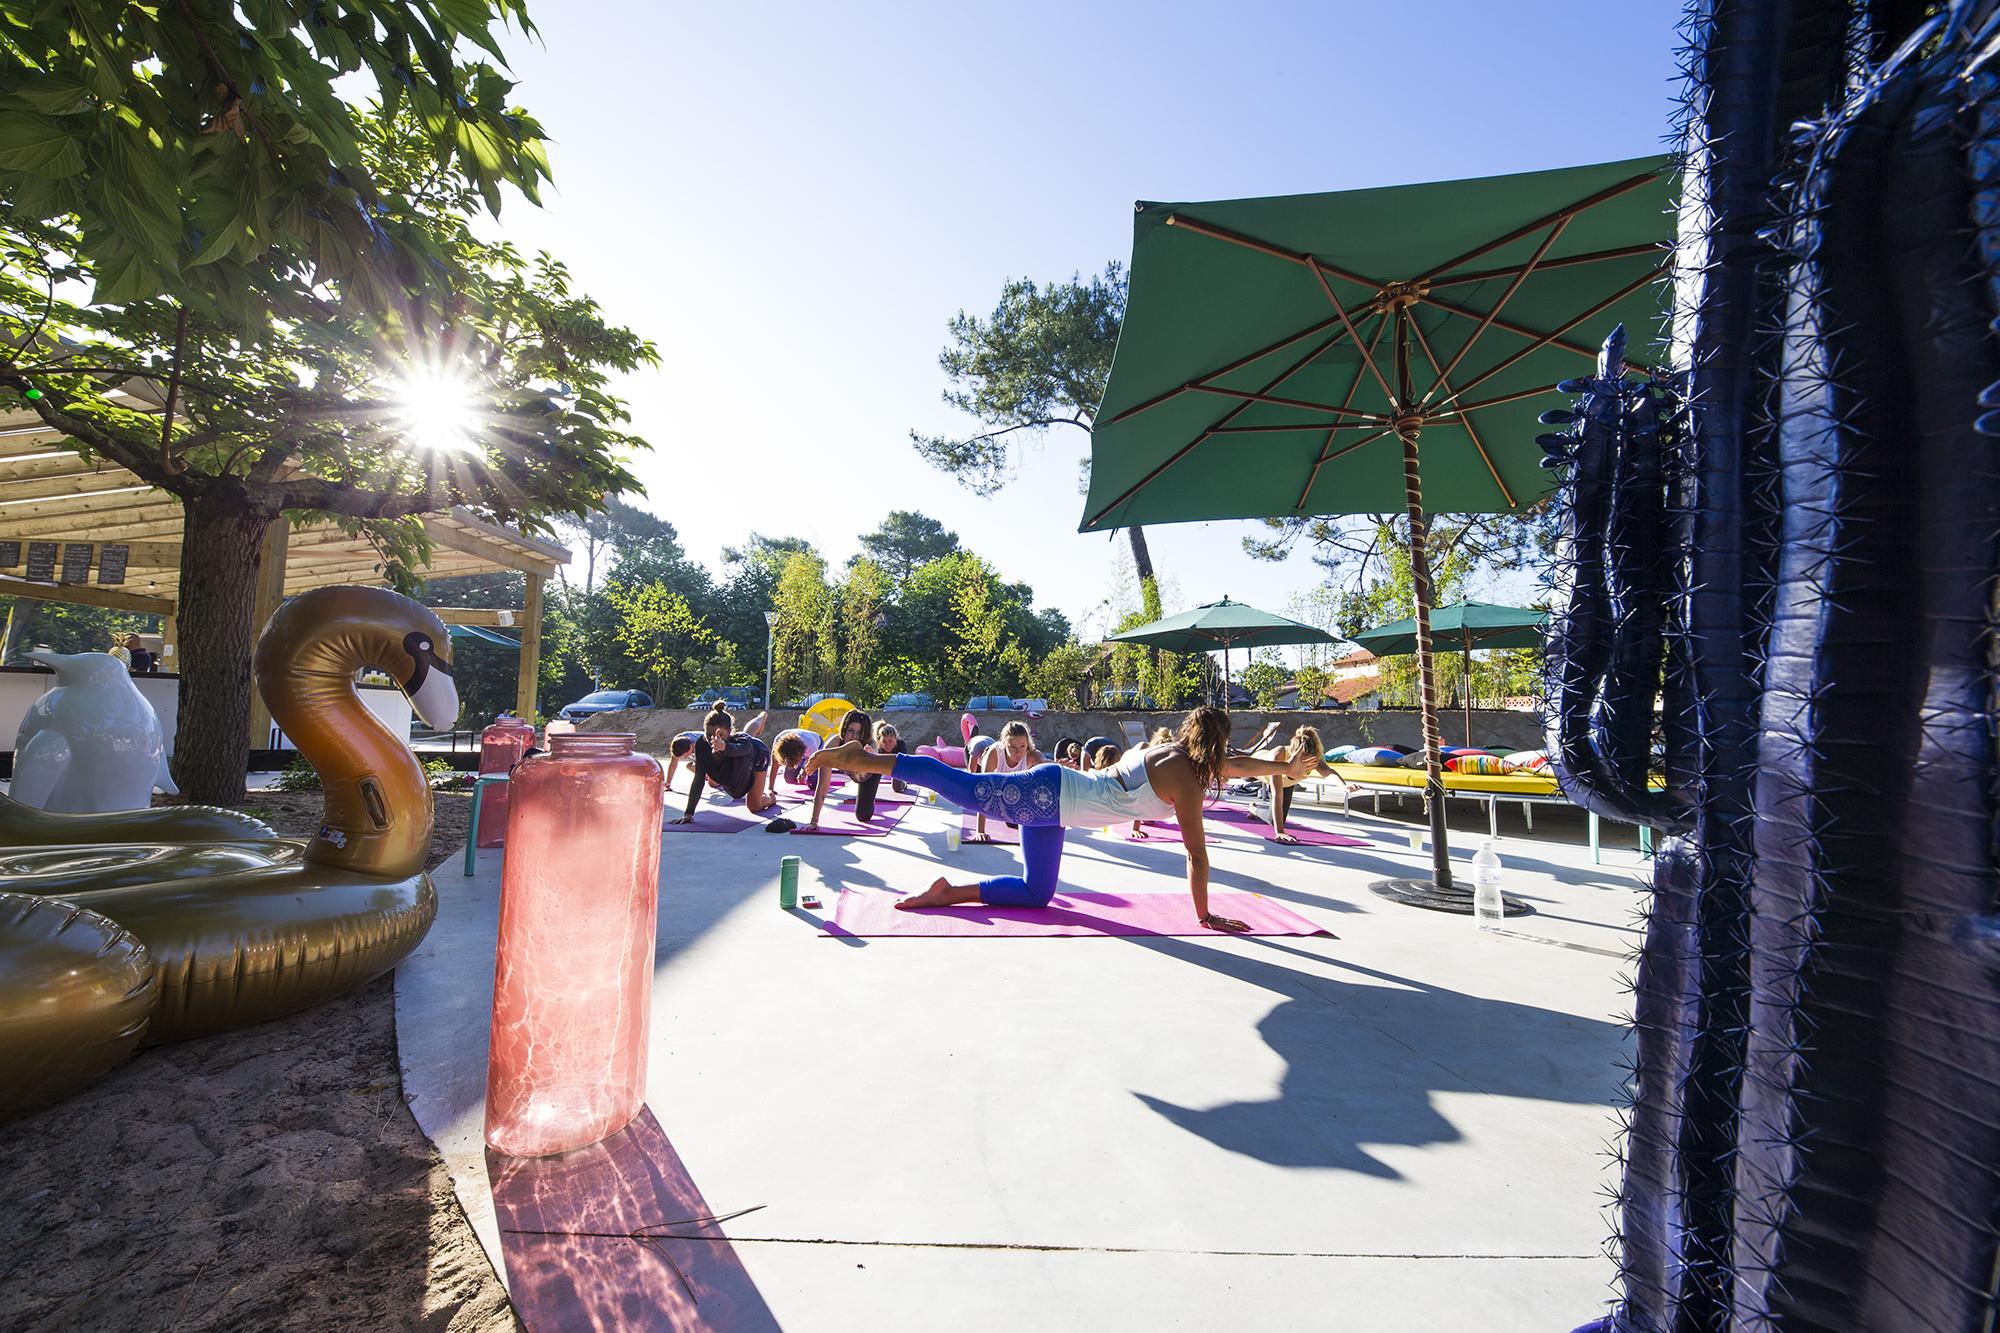 yoga-press-joandjoe-hossegor-2017-guillaume-arrieta-we-creative